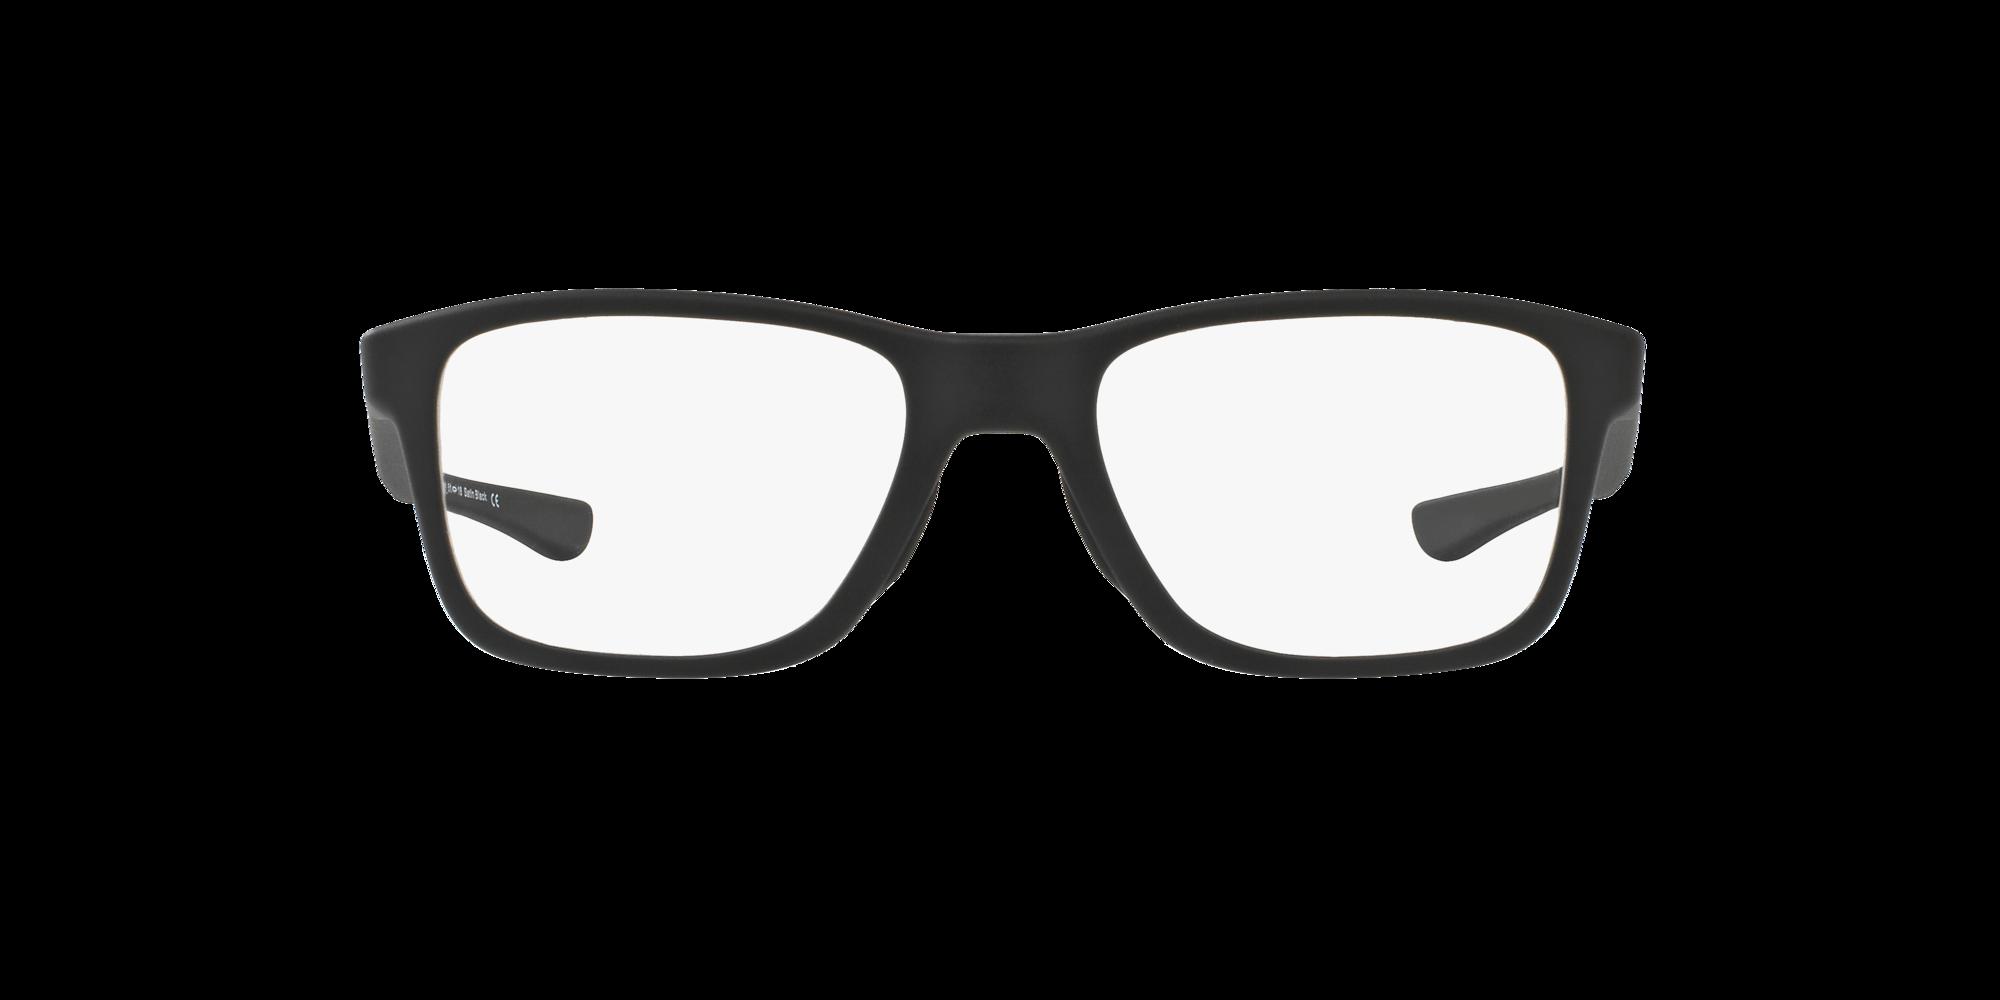 Image for OX8107 TRIM PLANE from LensCrafters | Glasses, Prescription Glasses Online, Eyewear